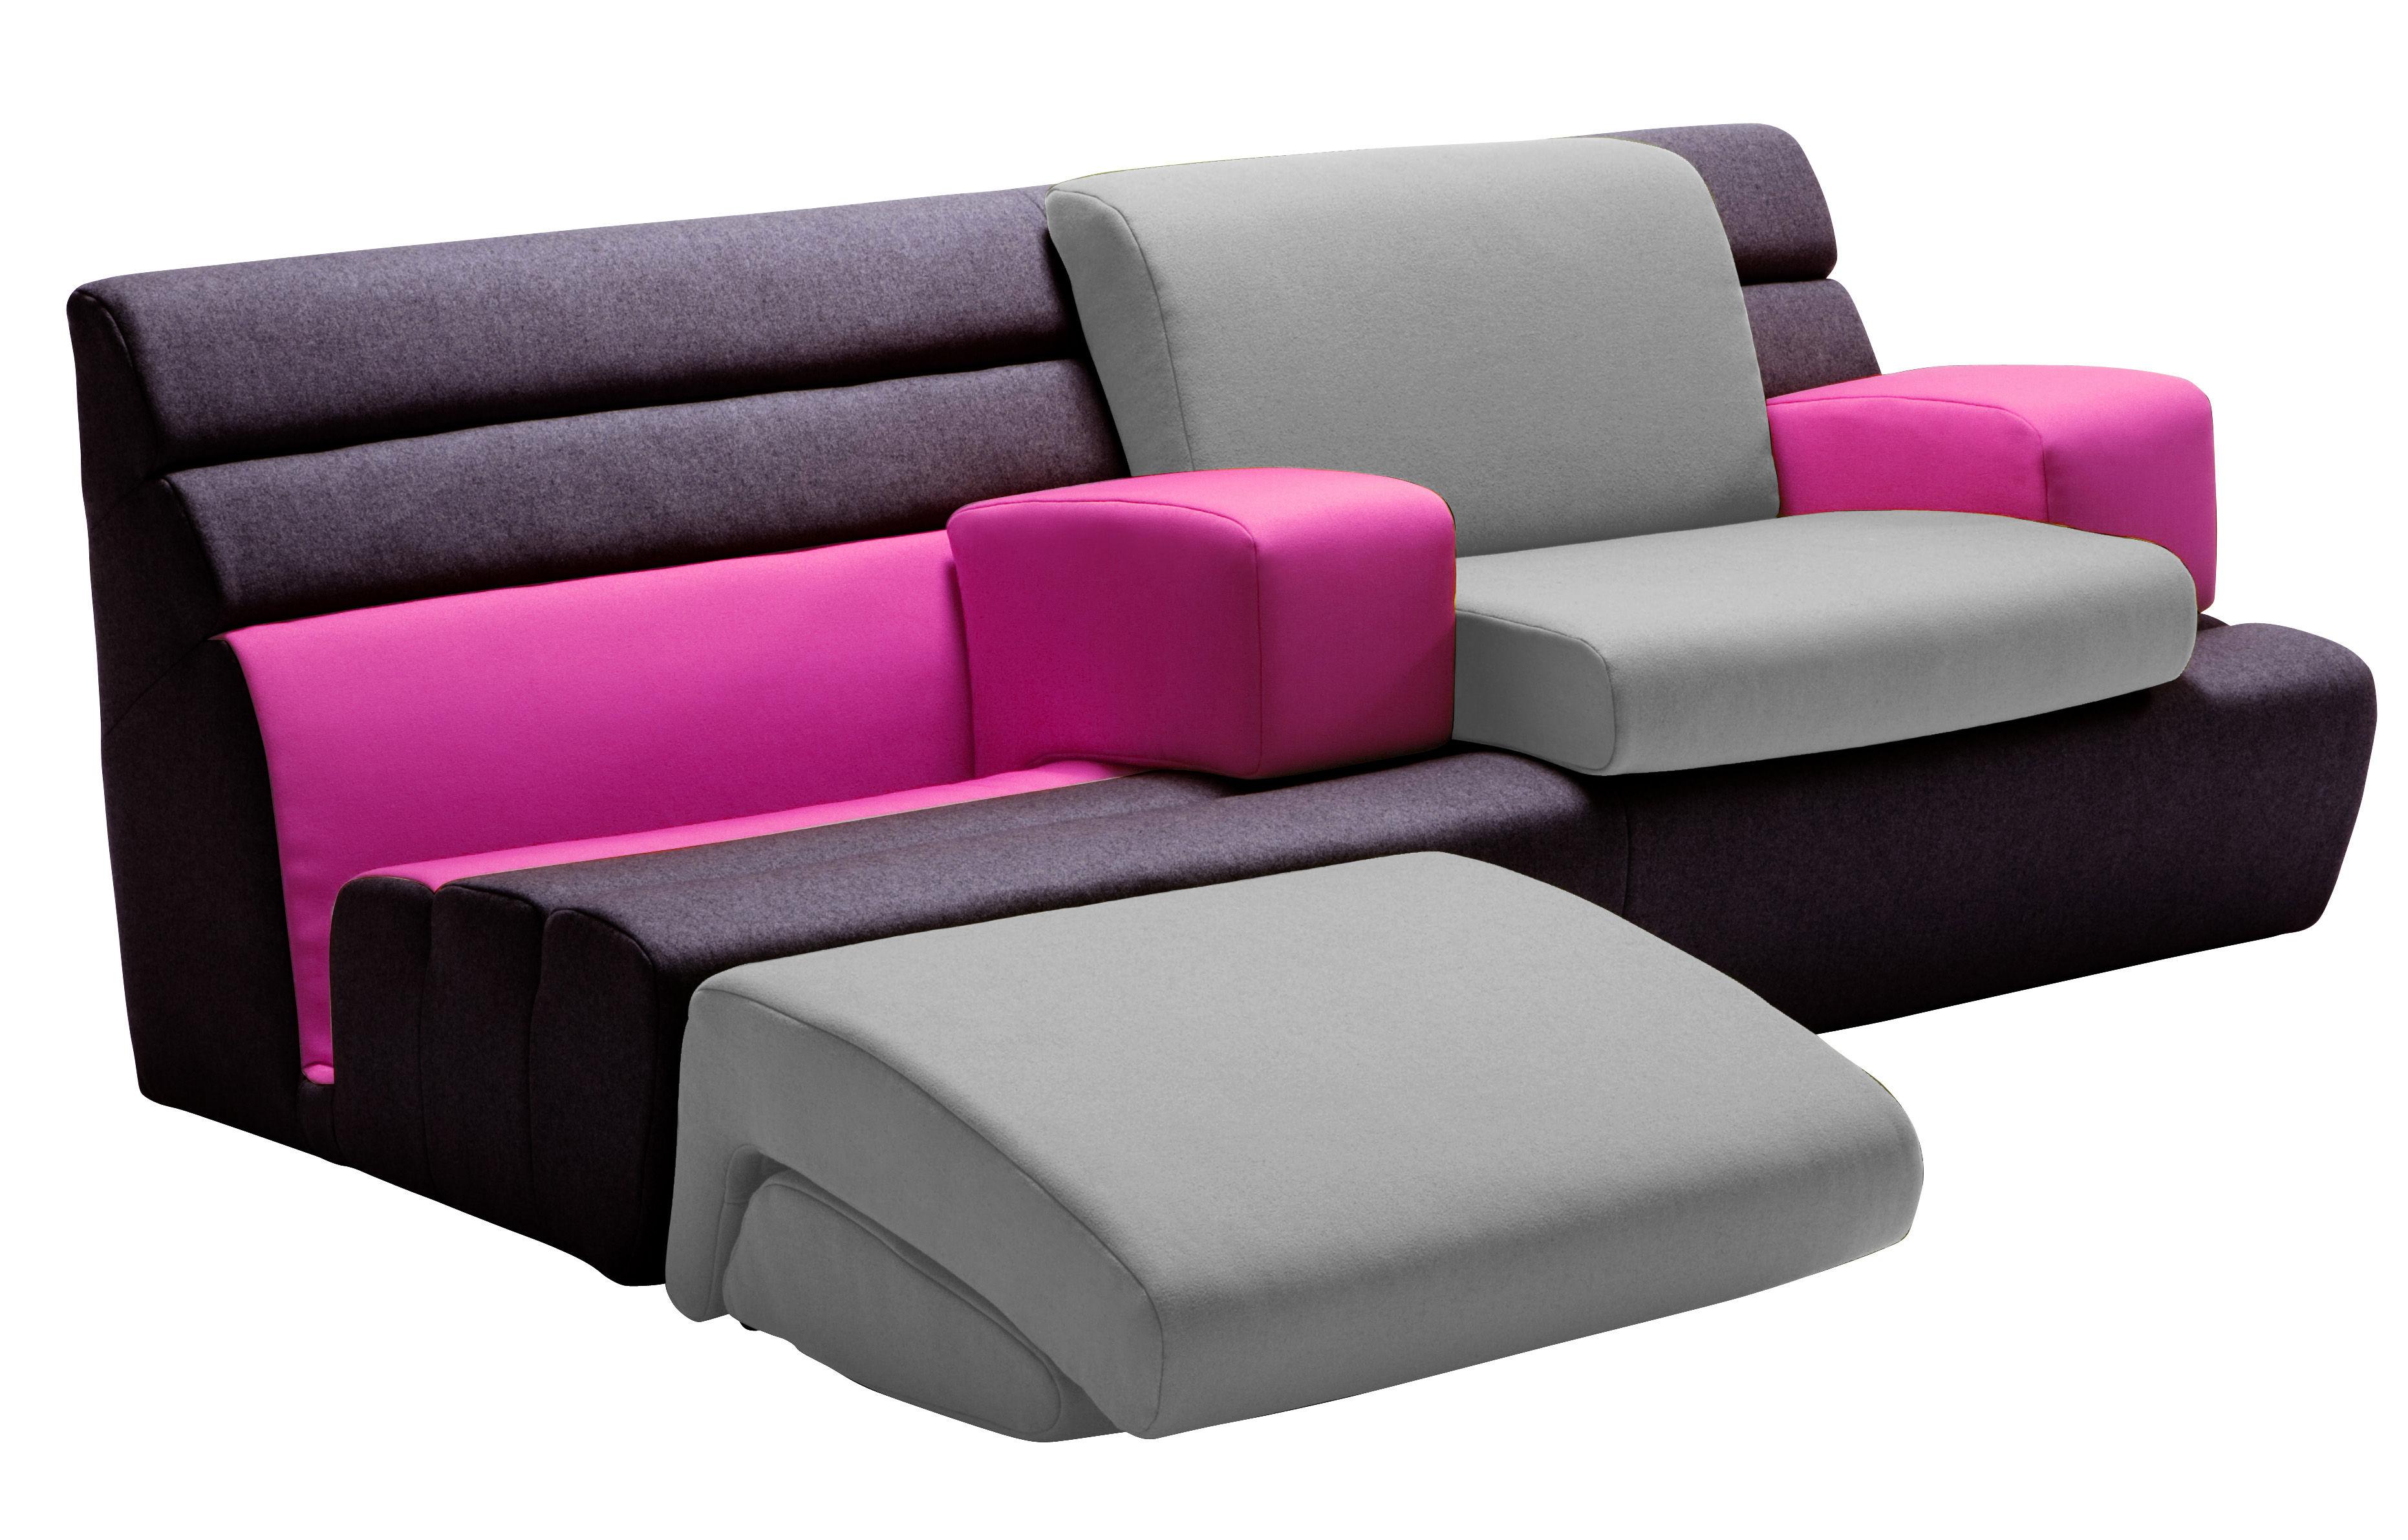 compo 39 sit by matali crasset variables sofa l 194 cm exklusiv dunlopillo sofa. Black Bedroom Furniture Sets. Home Design Ideas